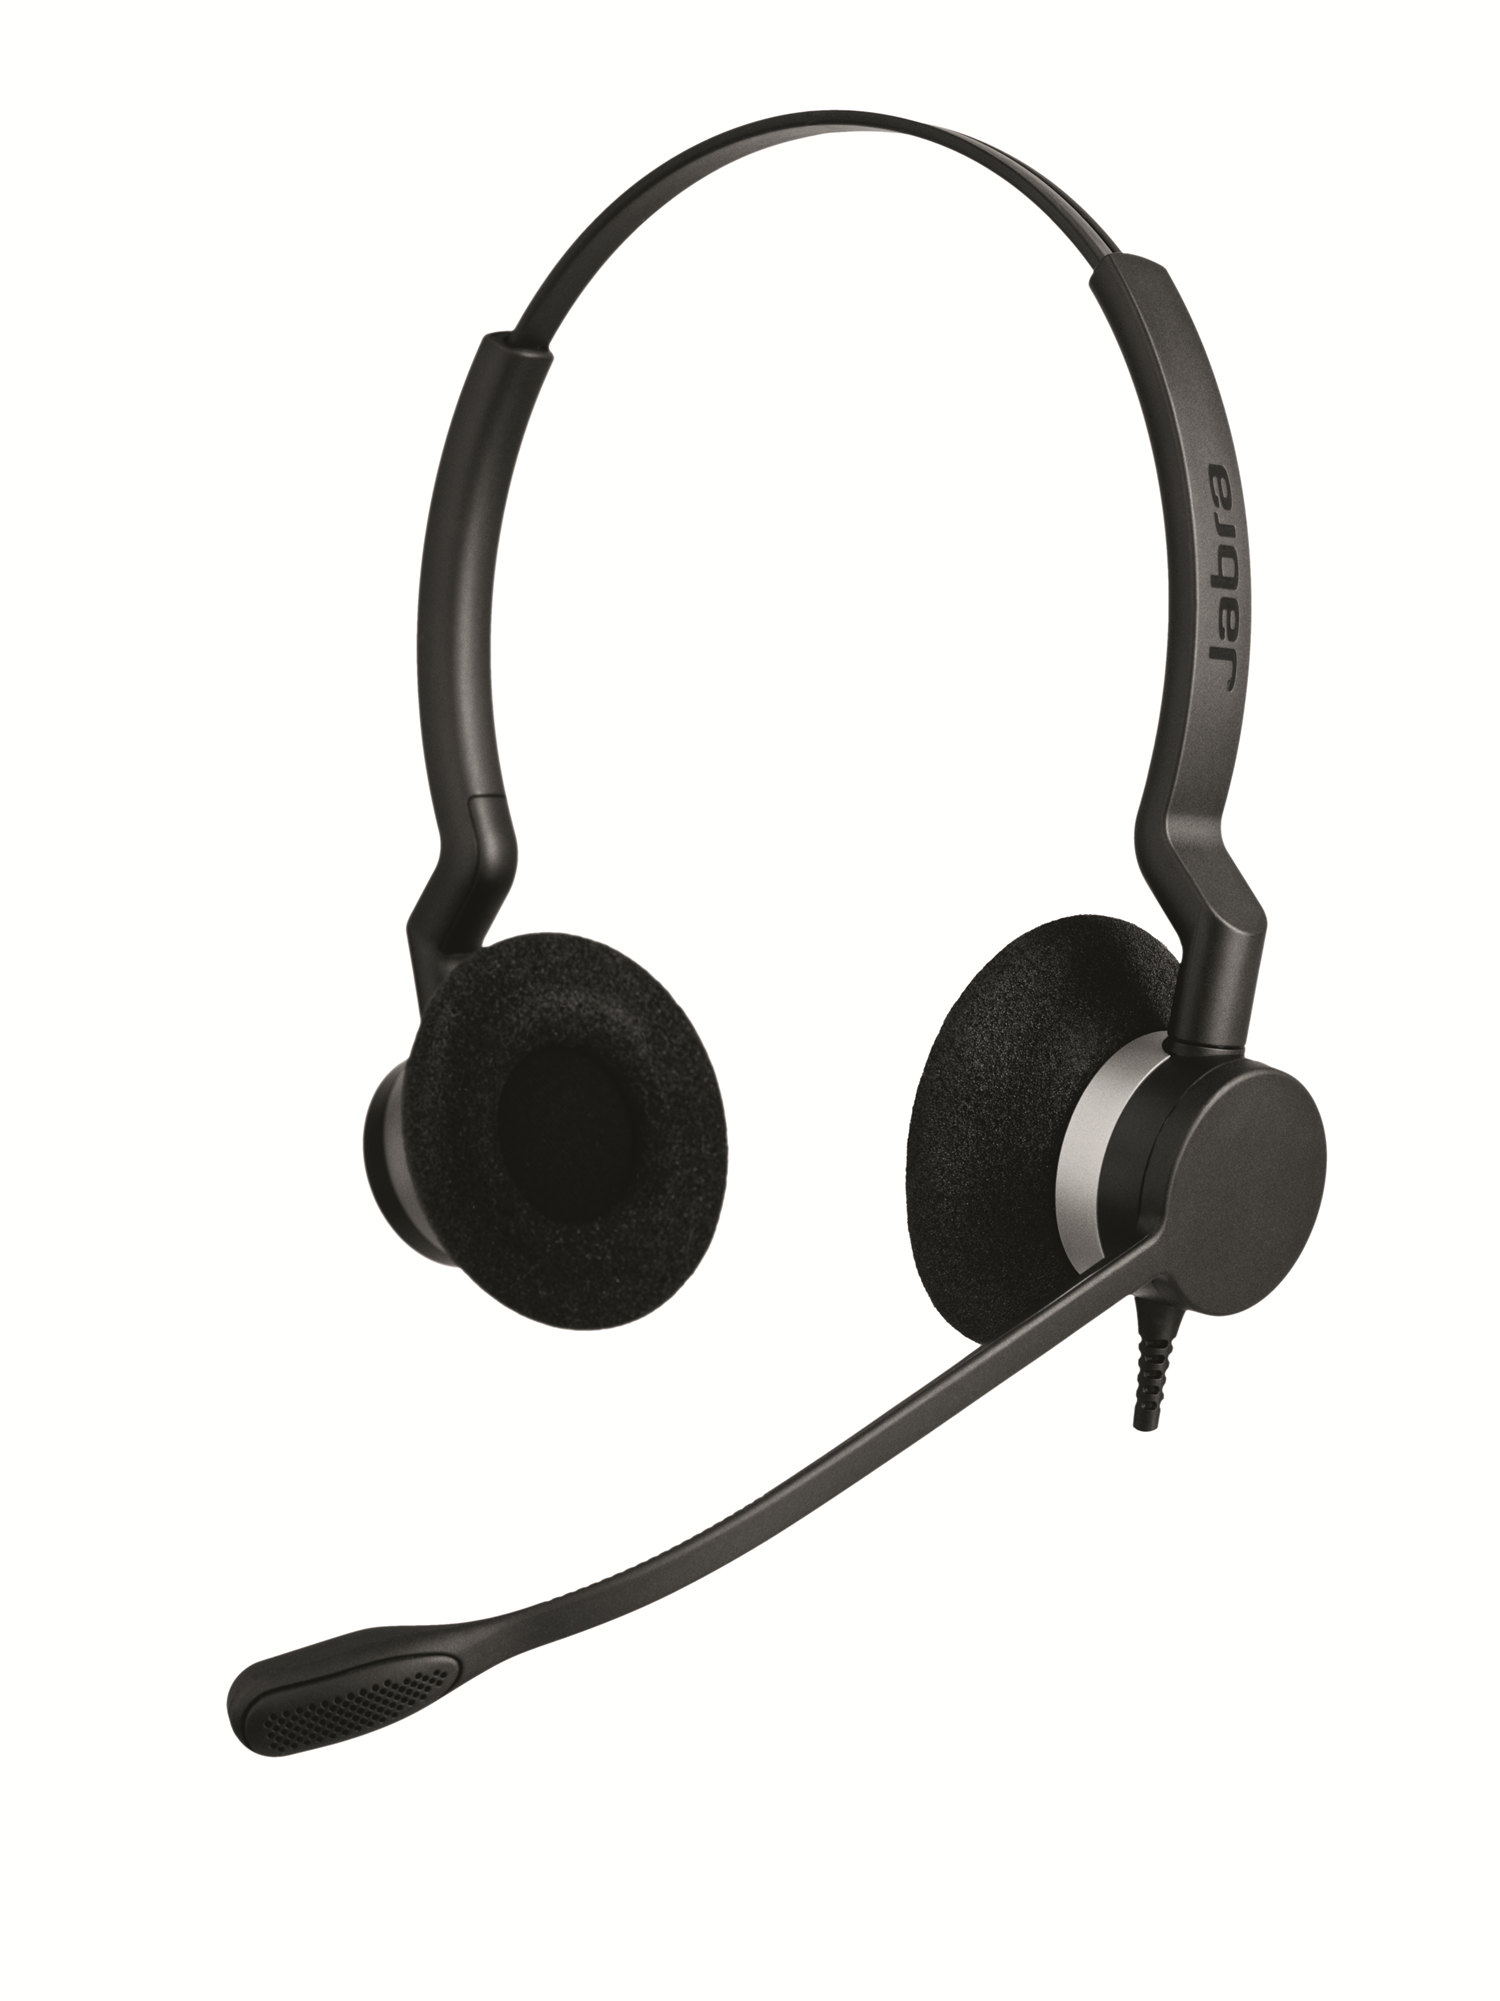 Jabra Biz 2300 QD Duo Office Headset